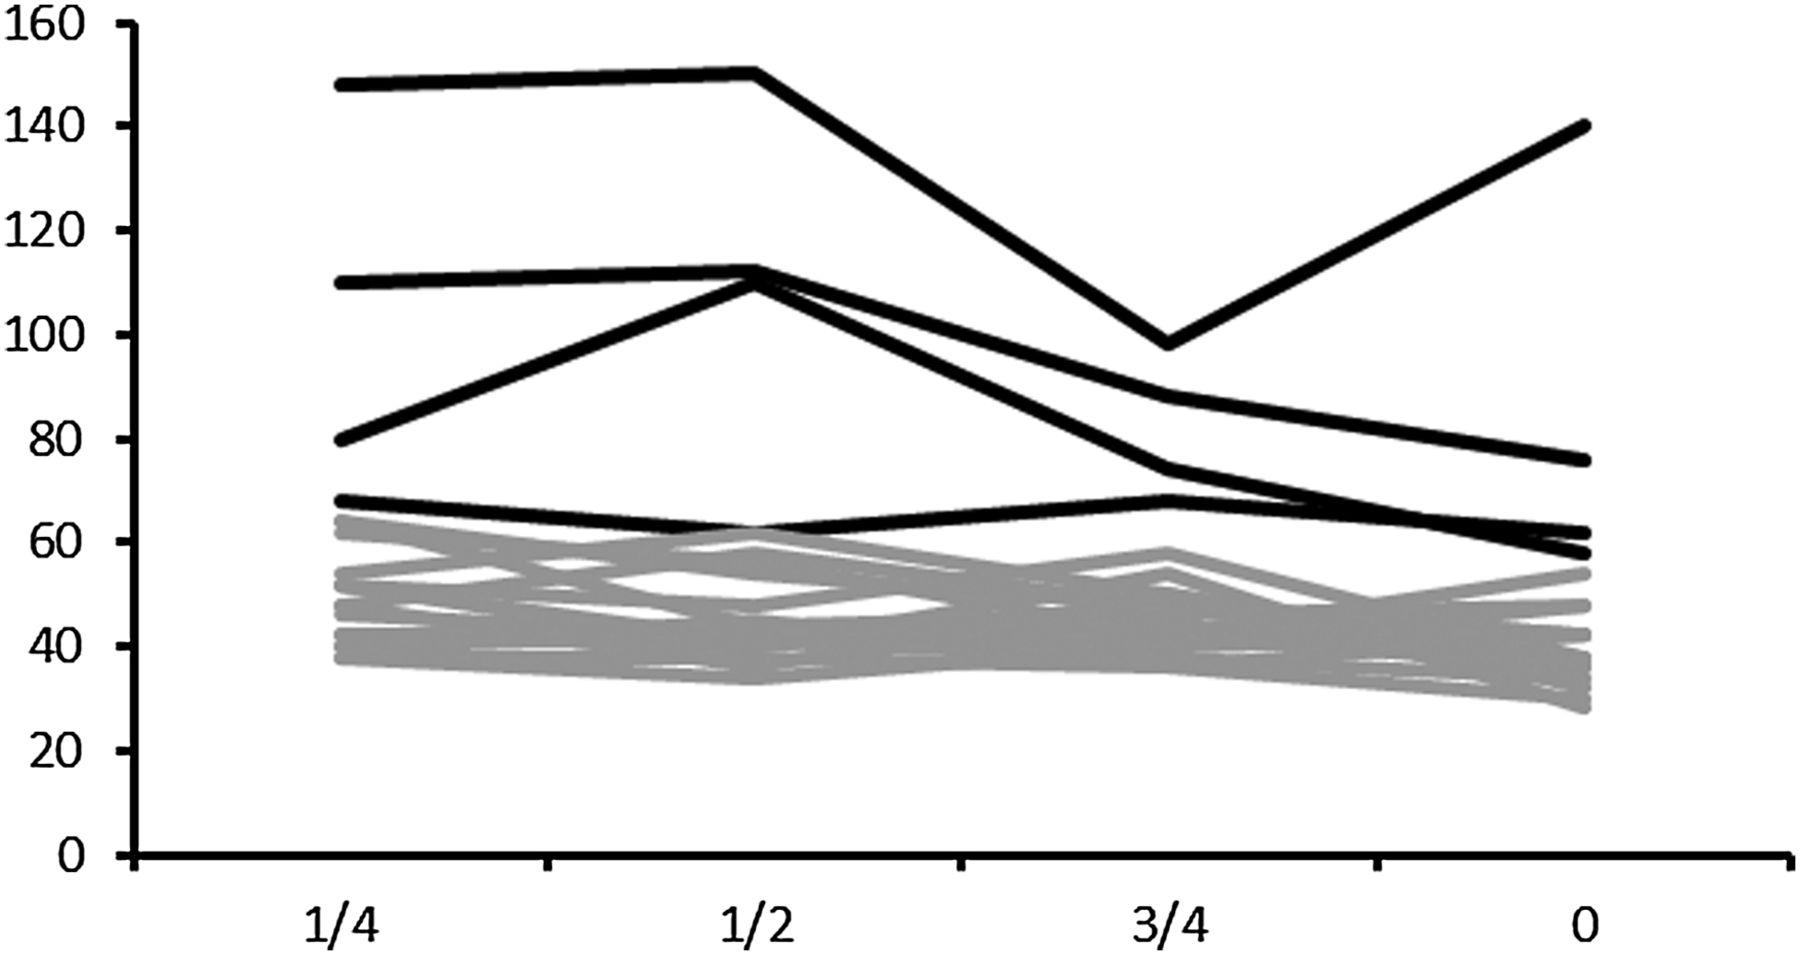 Valsalva using a syringe: pressure and variation